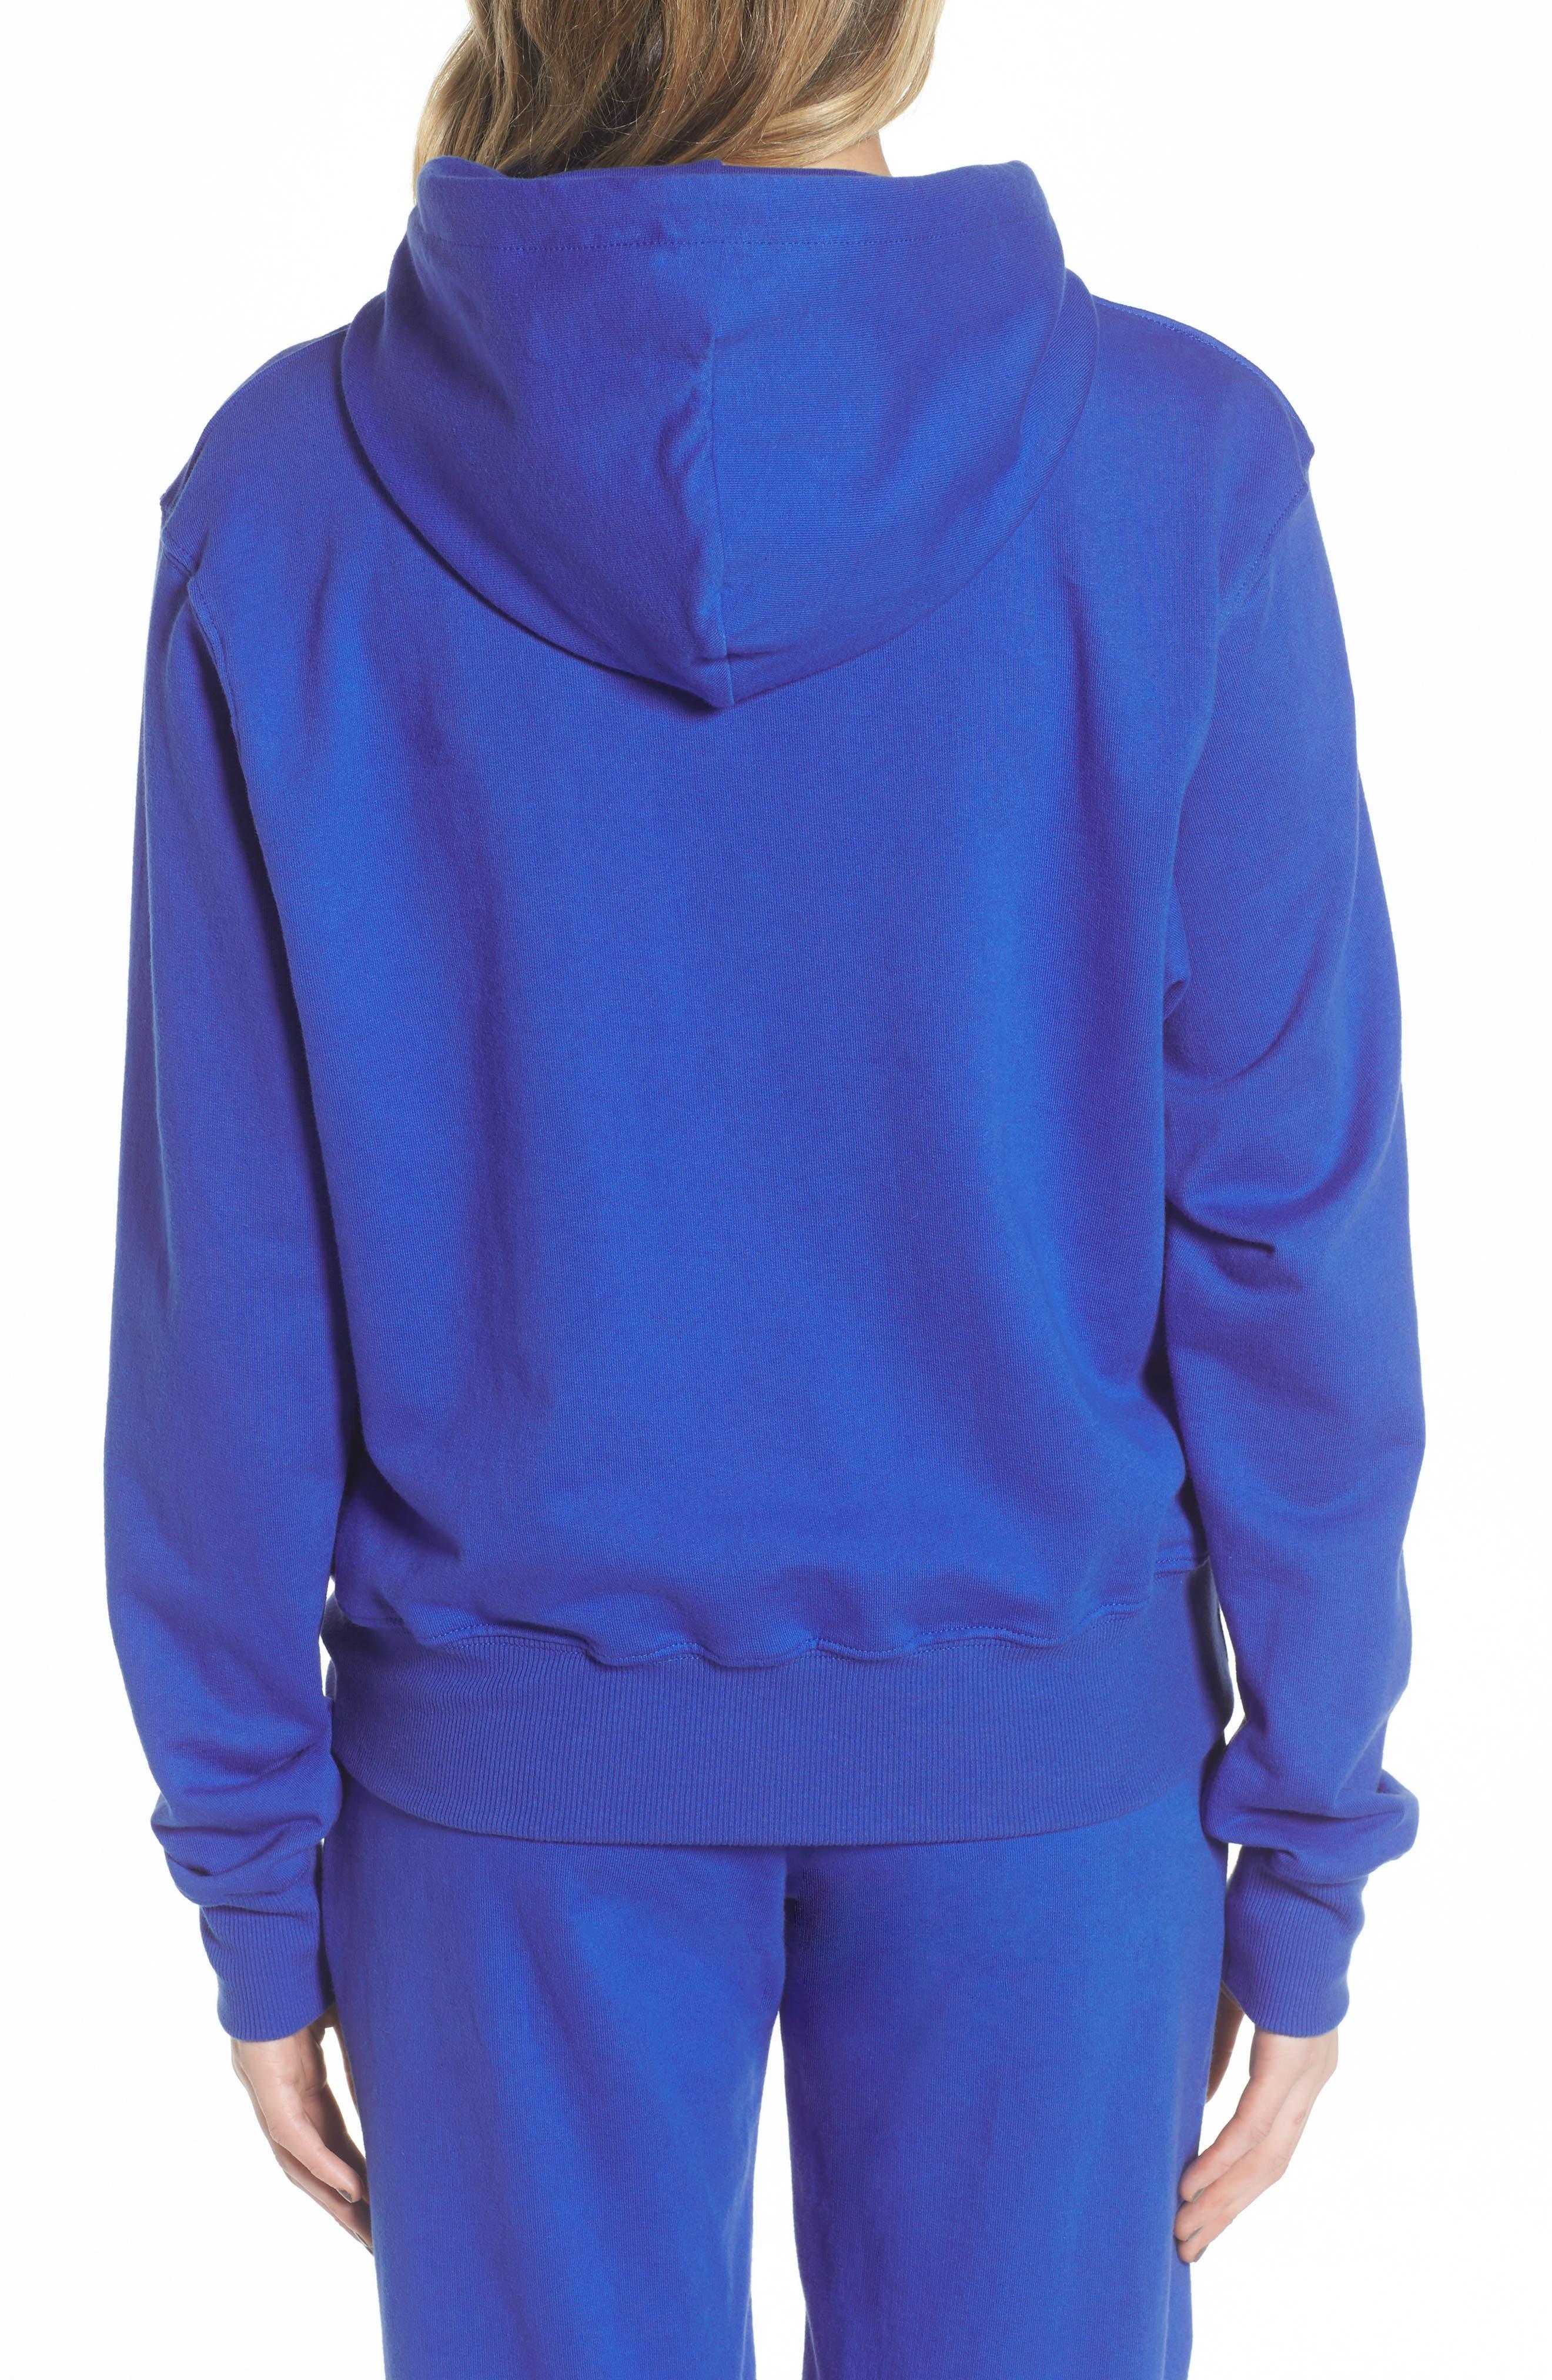 ME. Rose Pullover Hoodie,                             Alternate thumbnail 2, color,                             Royal Blue